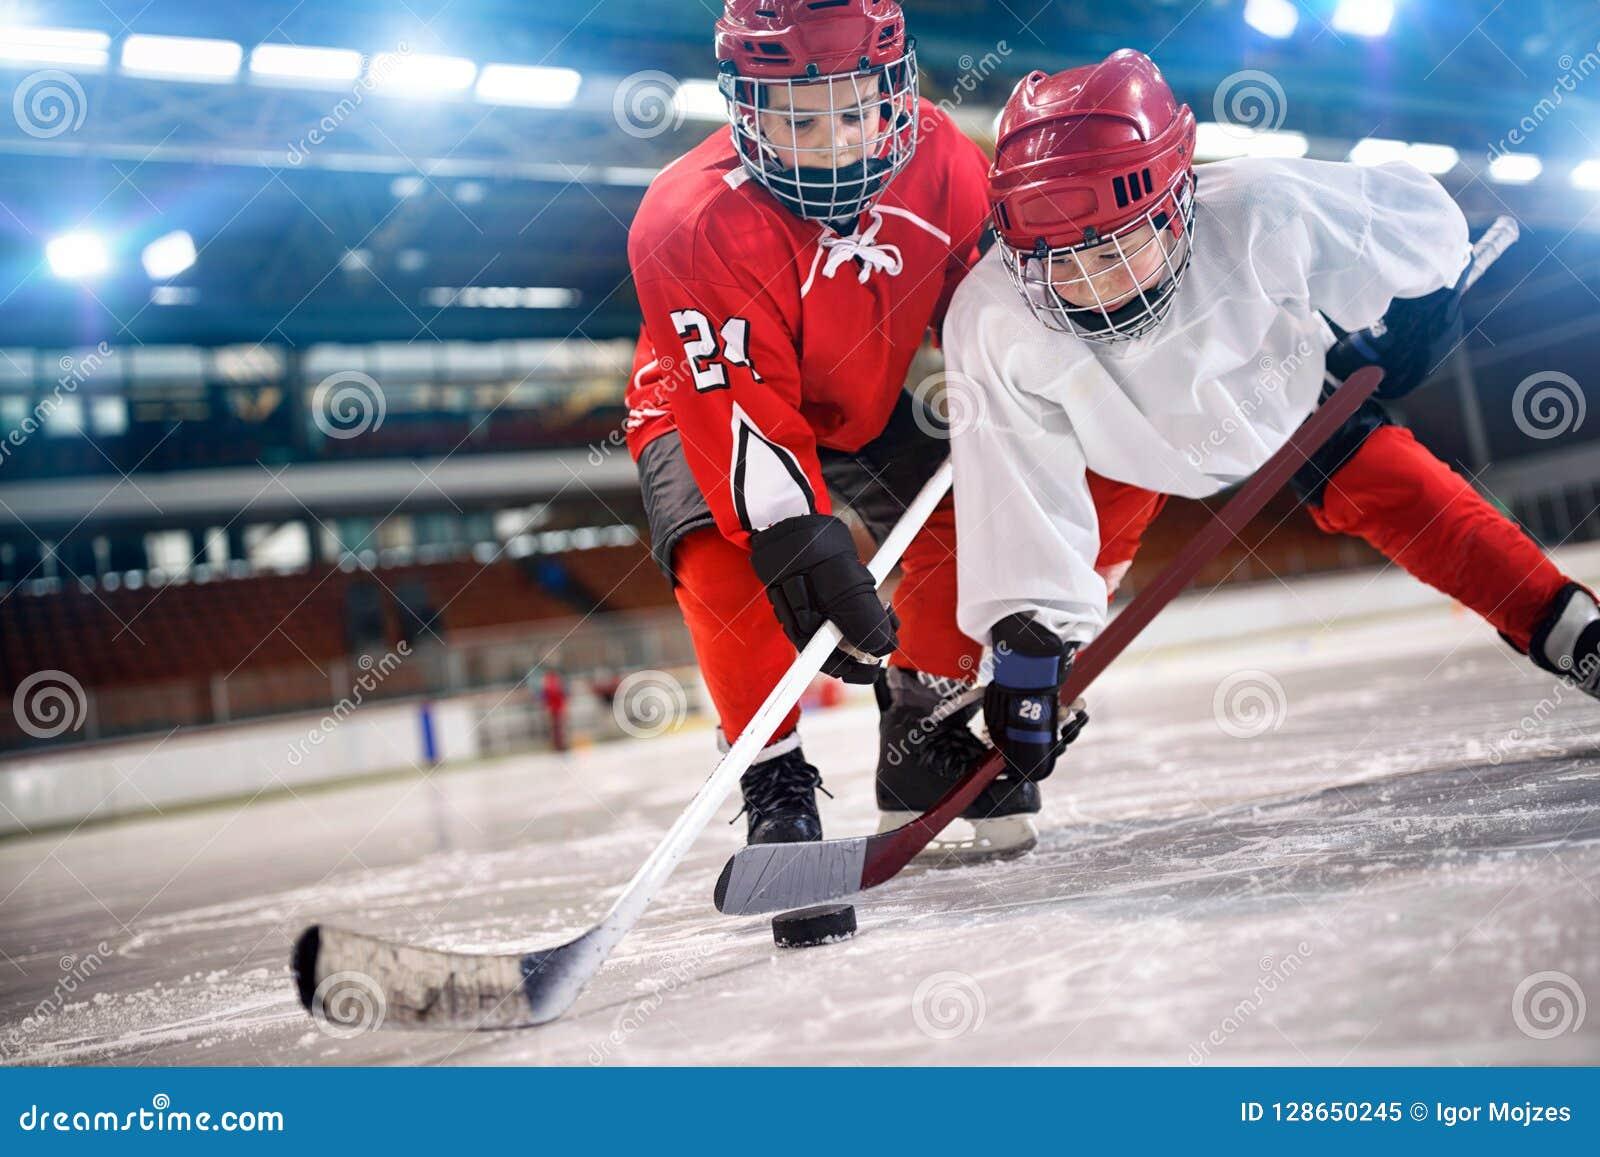 Children hockey player handling puck on ice